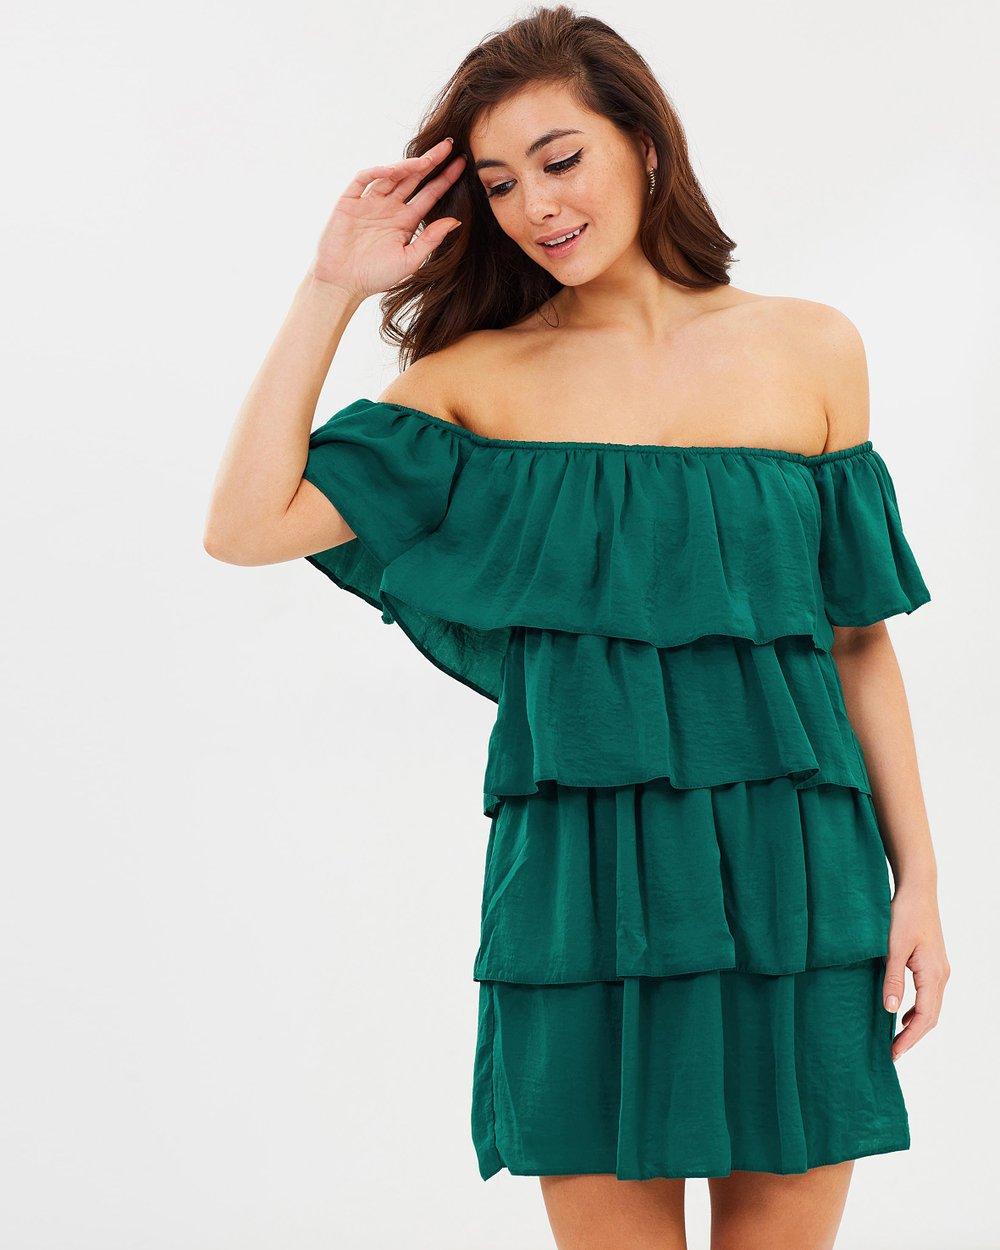 32482ddedd7 Tiered Ruffle Bardot Dress by Lipsy Online